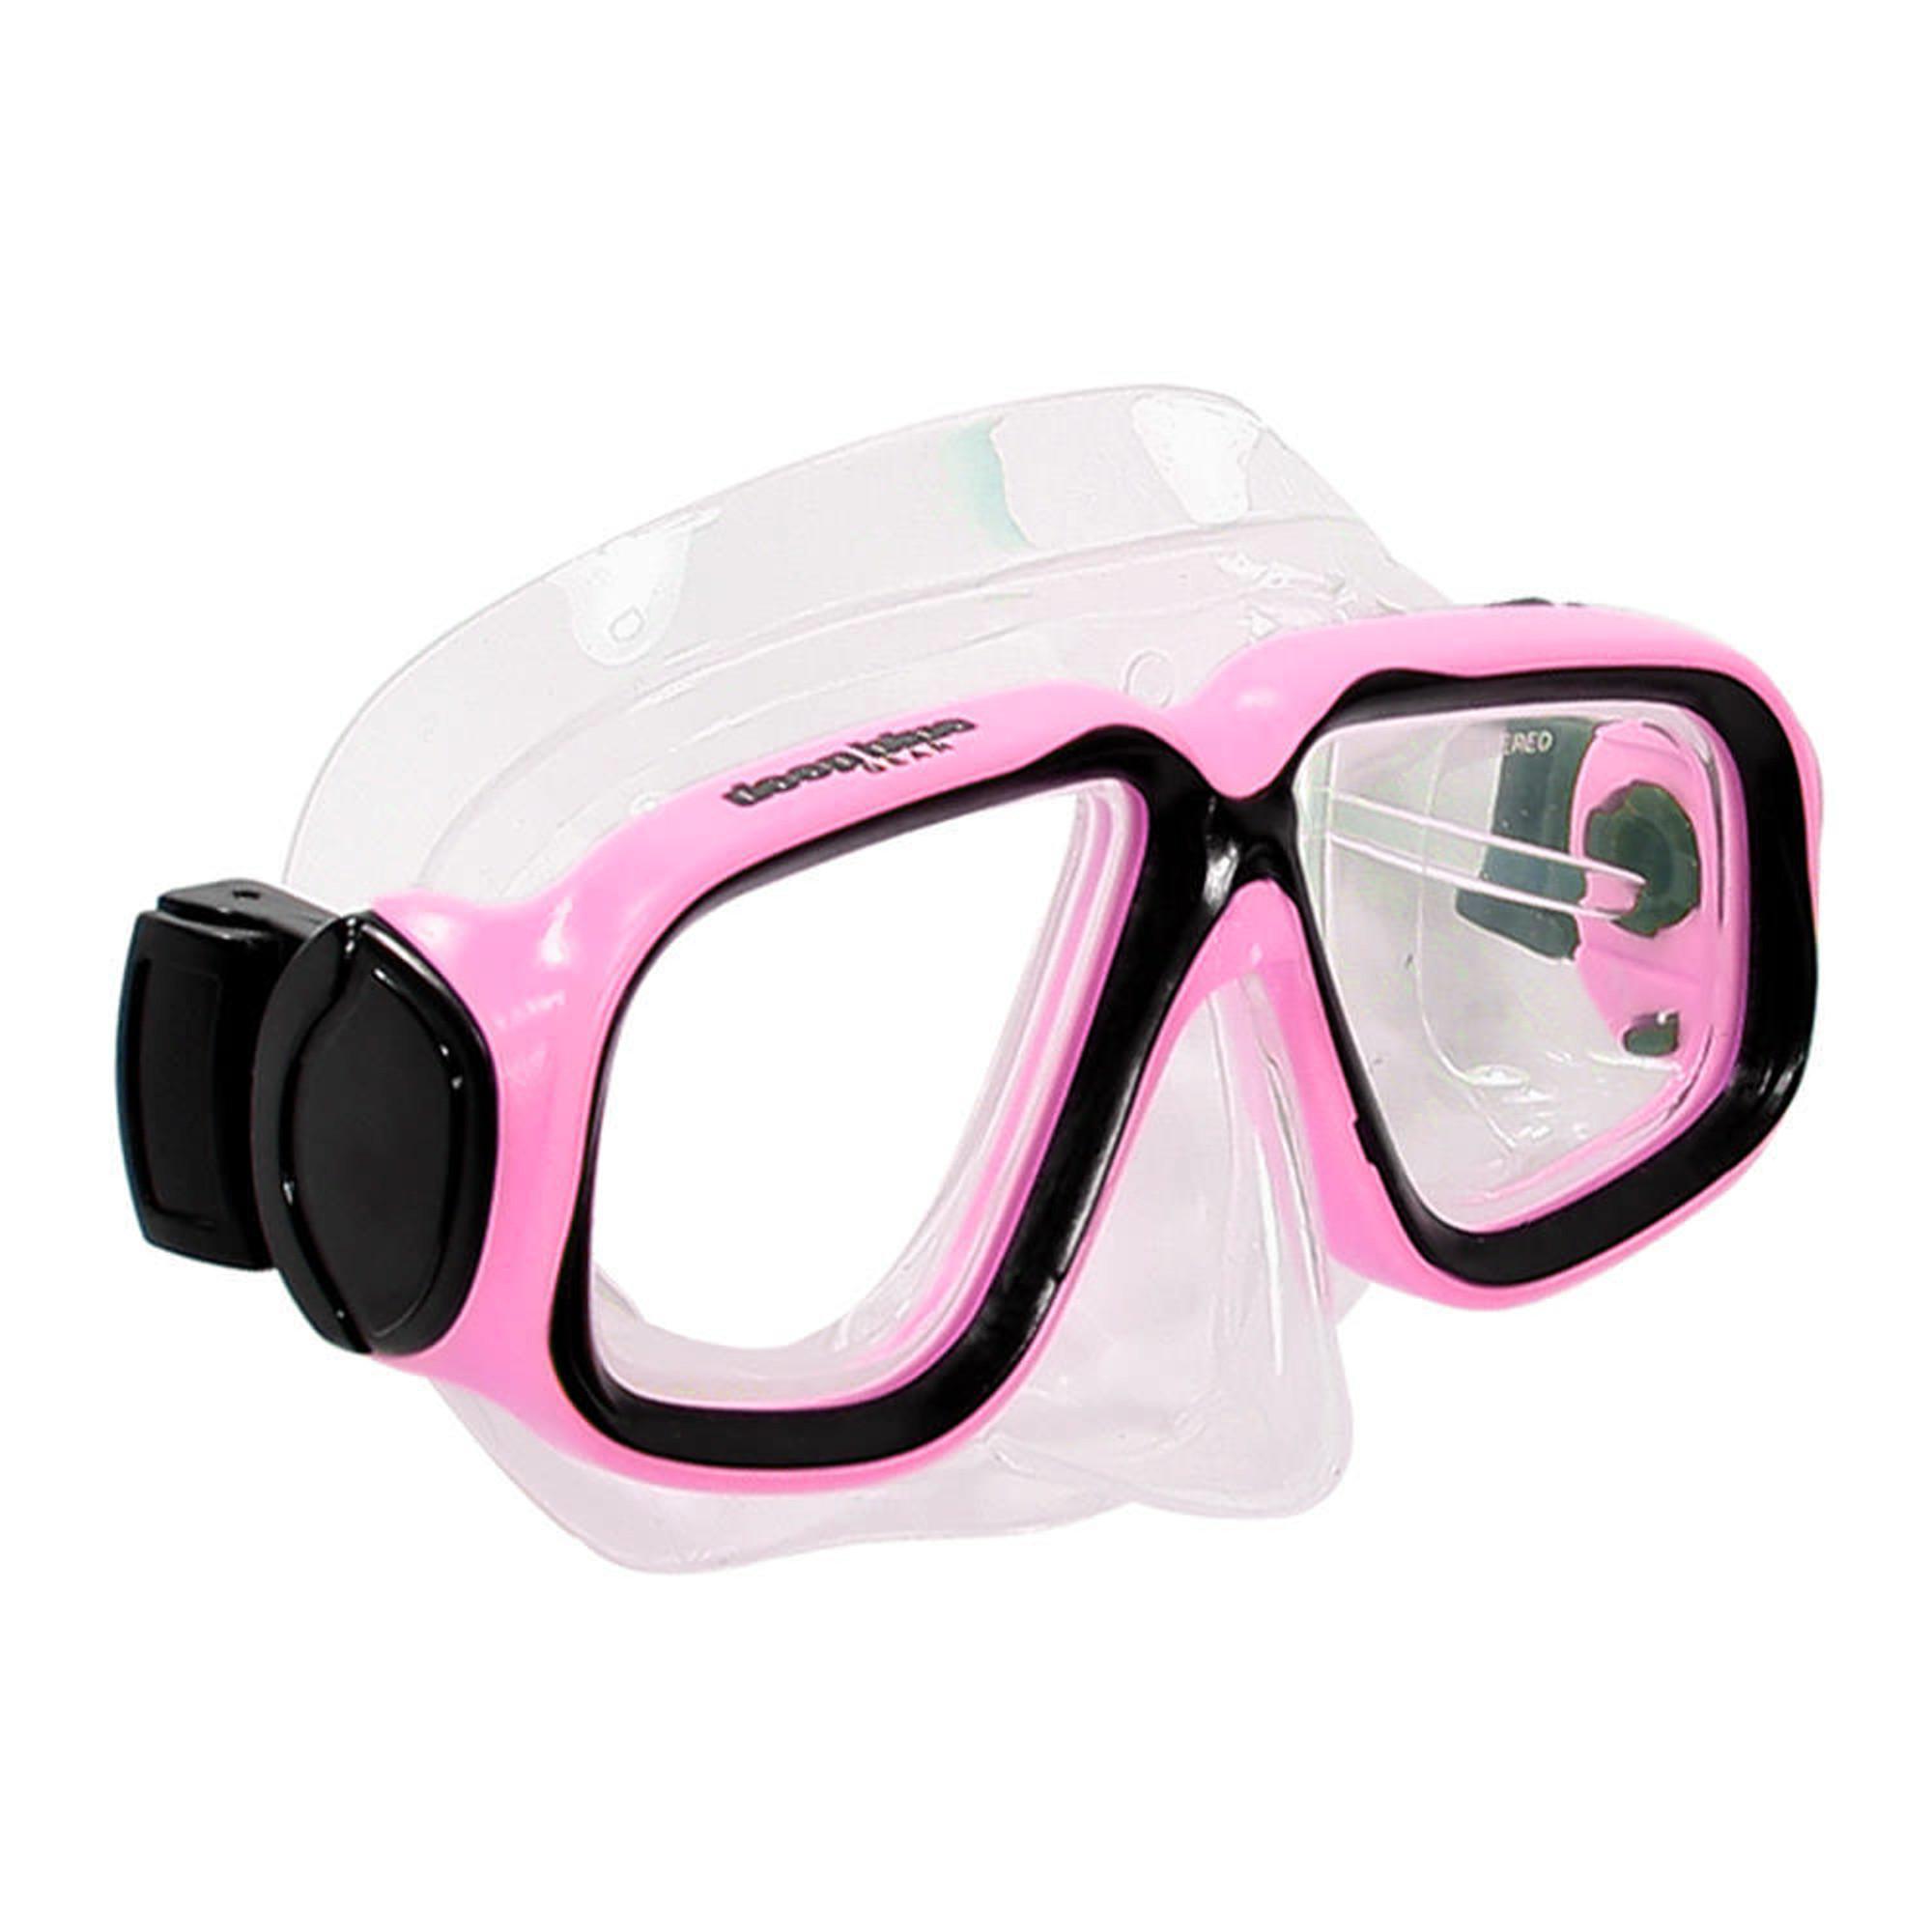 Maui Junior - Kid's Diving/Snorkeling Mask